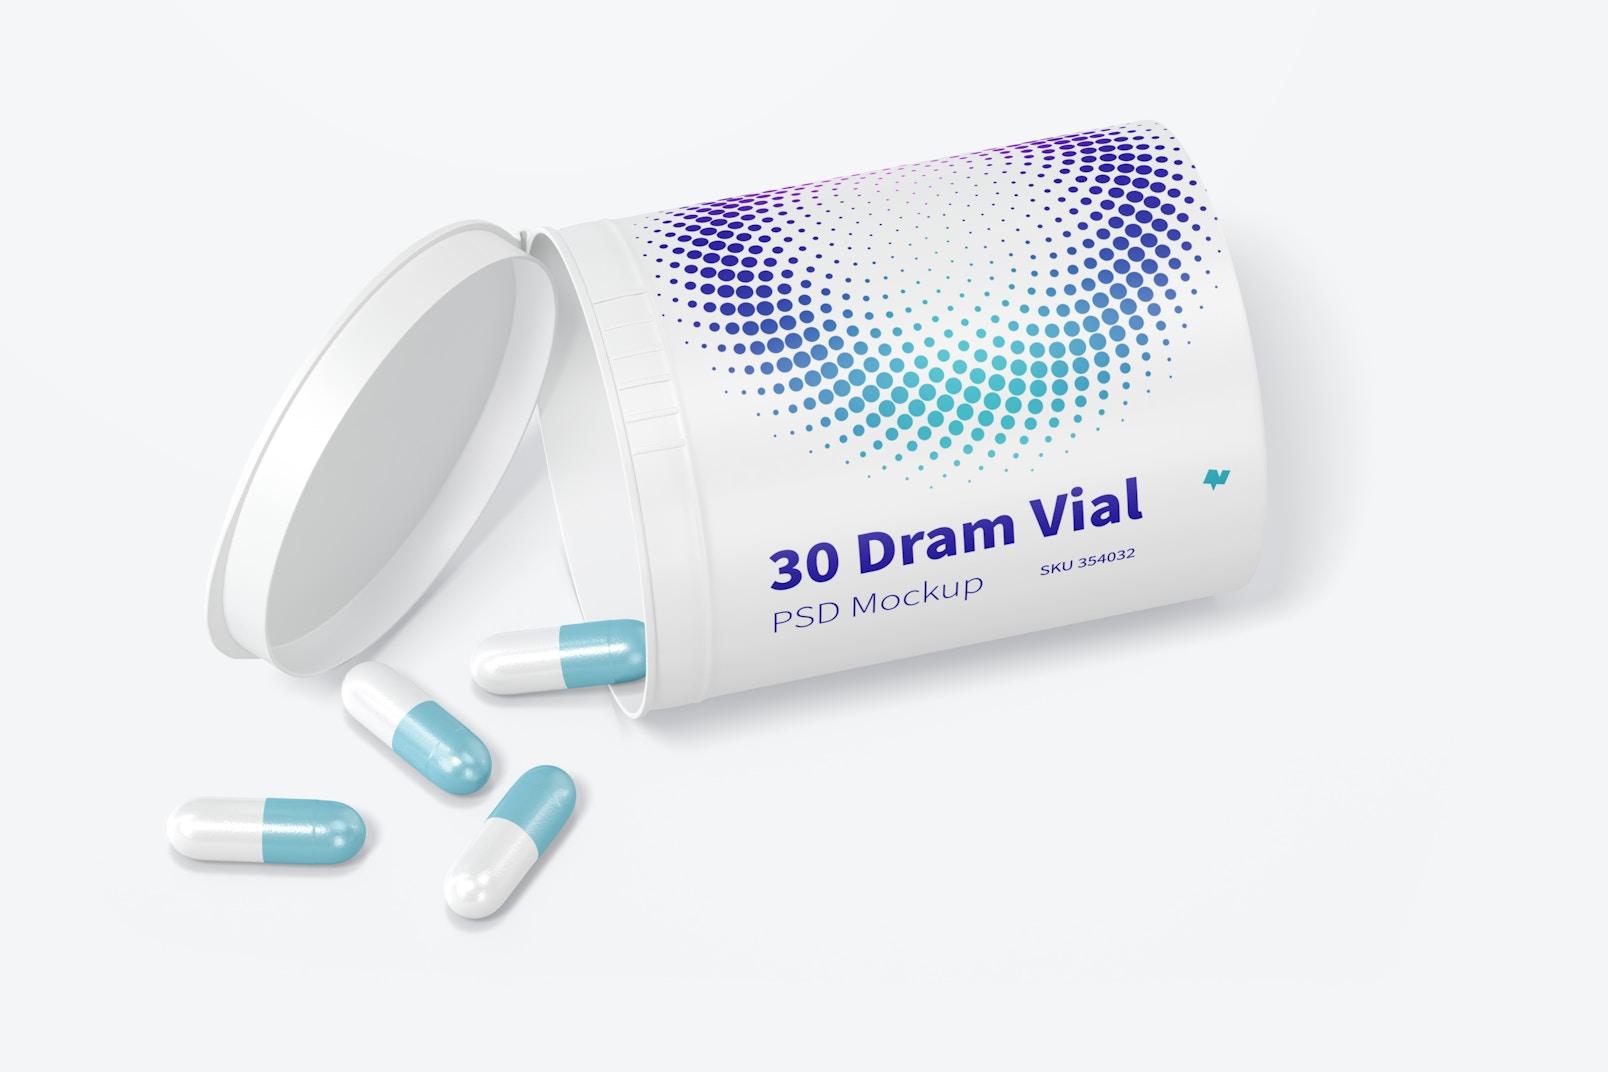 30 Dram Vial with Hinge Top Mockup, Opened